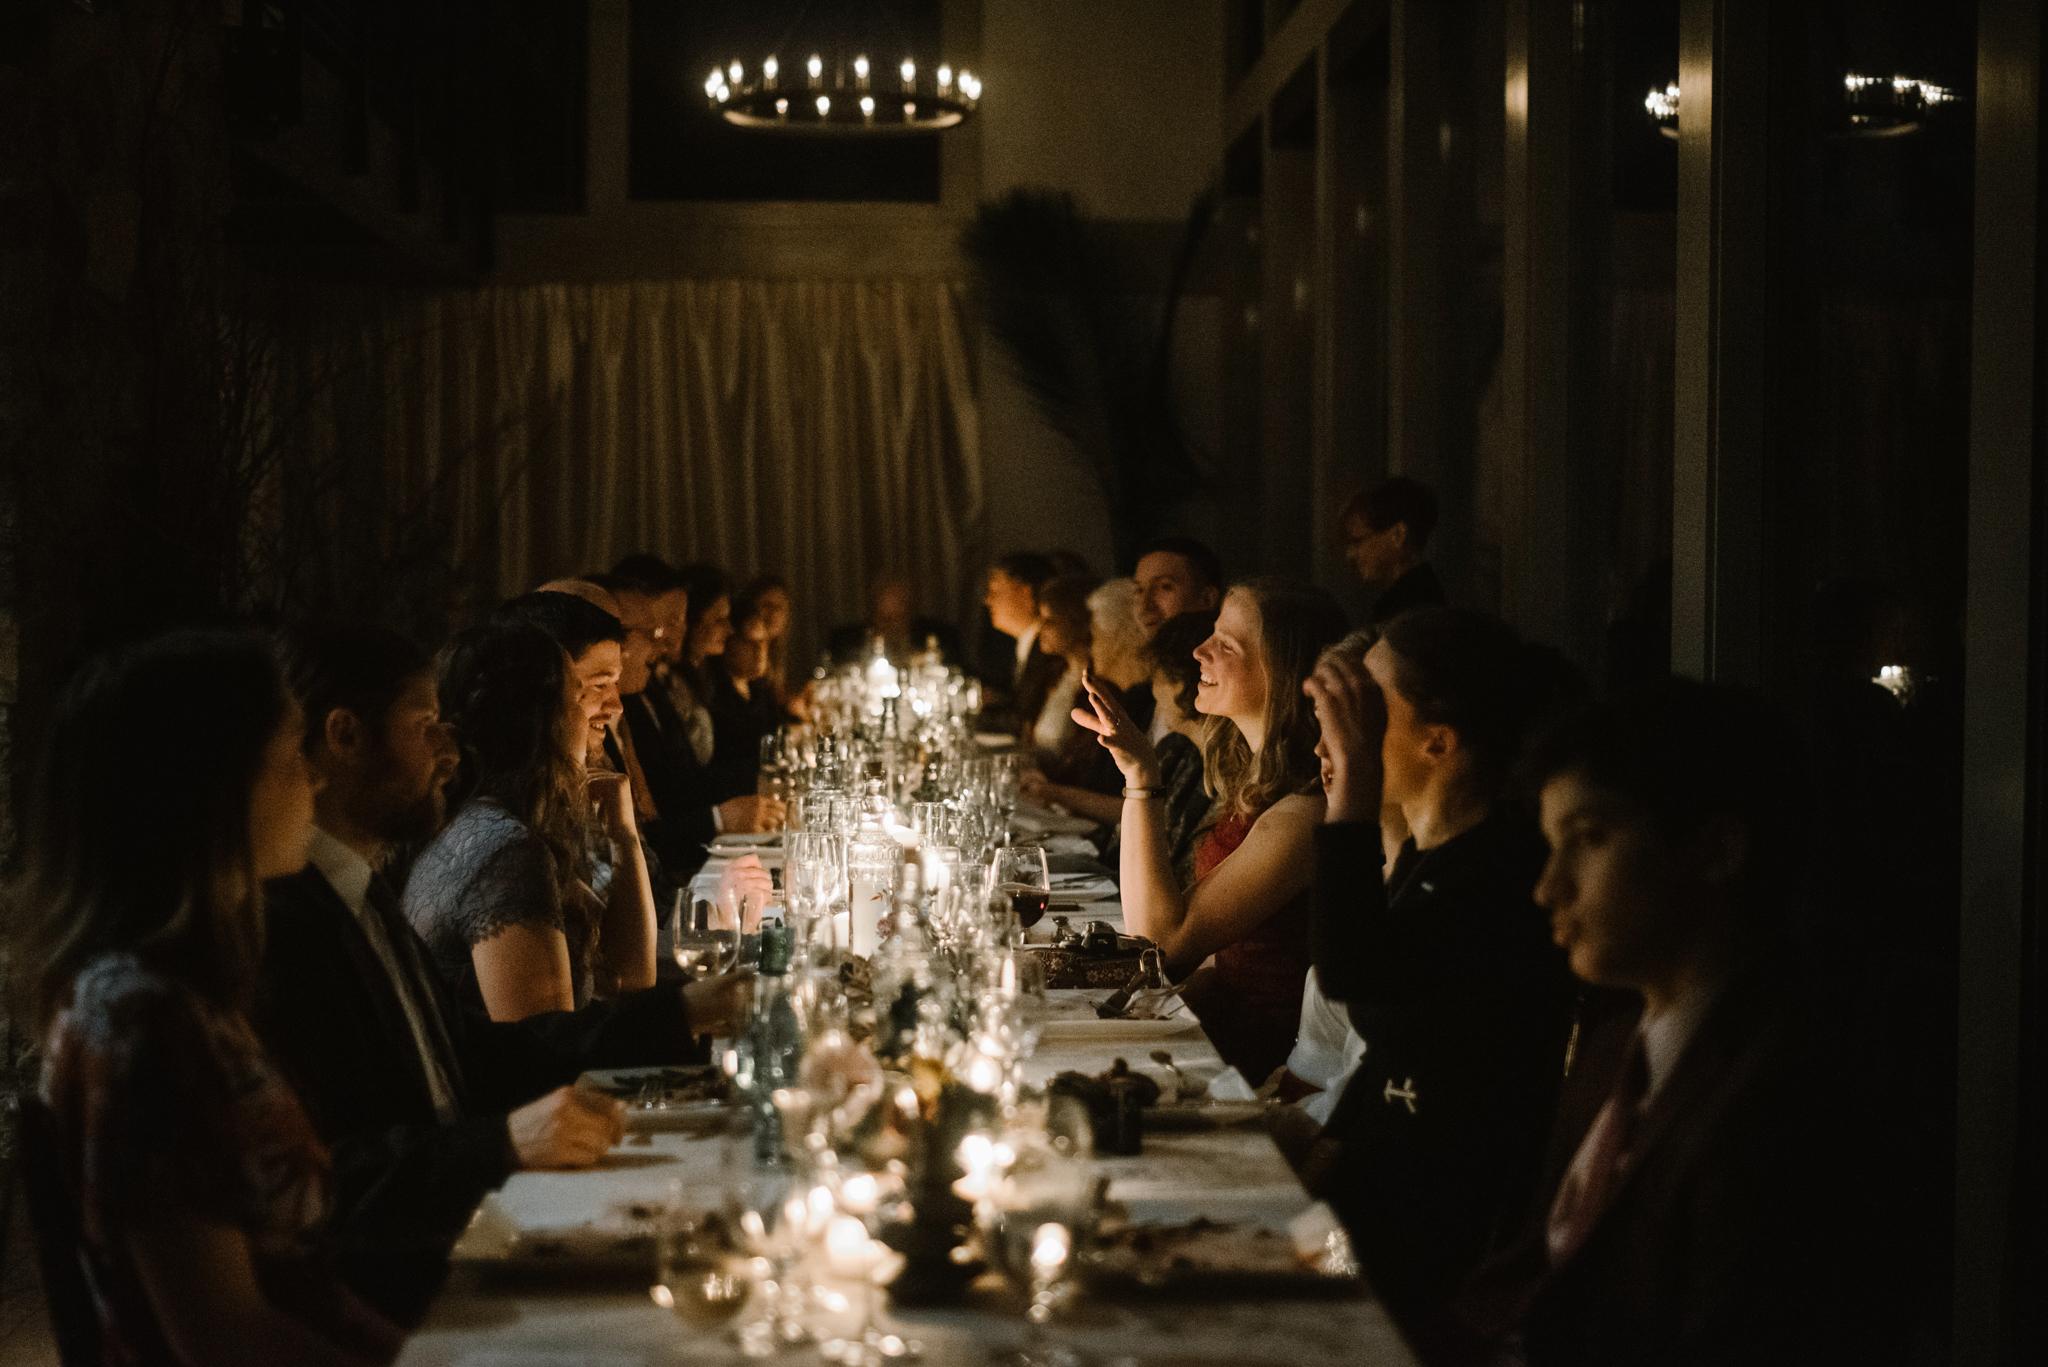 Intimate Dinner Wedding - Small Wedding with Candlelit Dinner - Sperryville Virginia Wedding - Backyard Wedding - Flourish Root Wedding Flowers - White Sails Creative Wedding - Cozy Wedding - Casual Wedding - Intimate Wedding_51.jpg